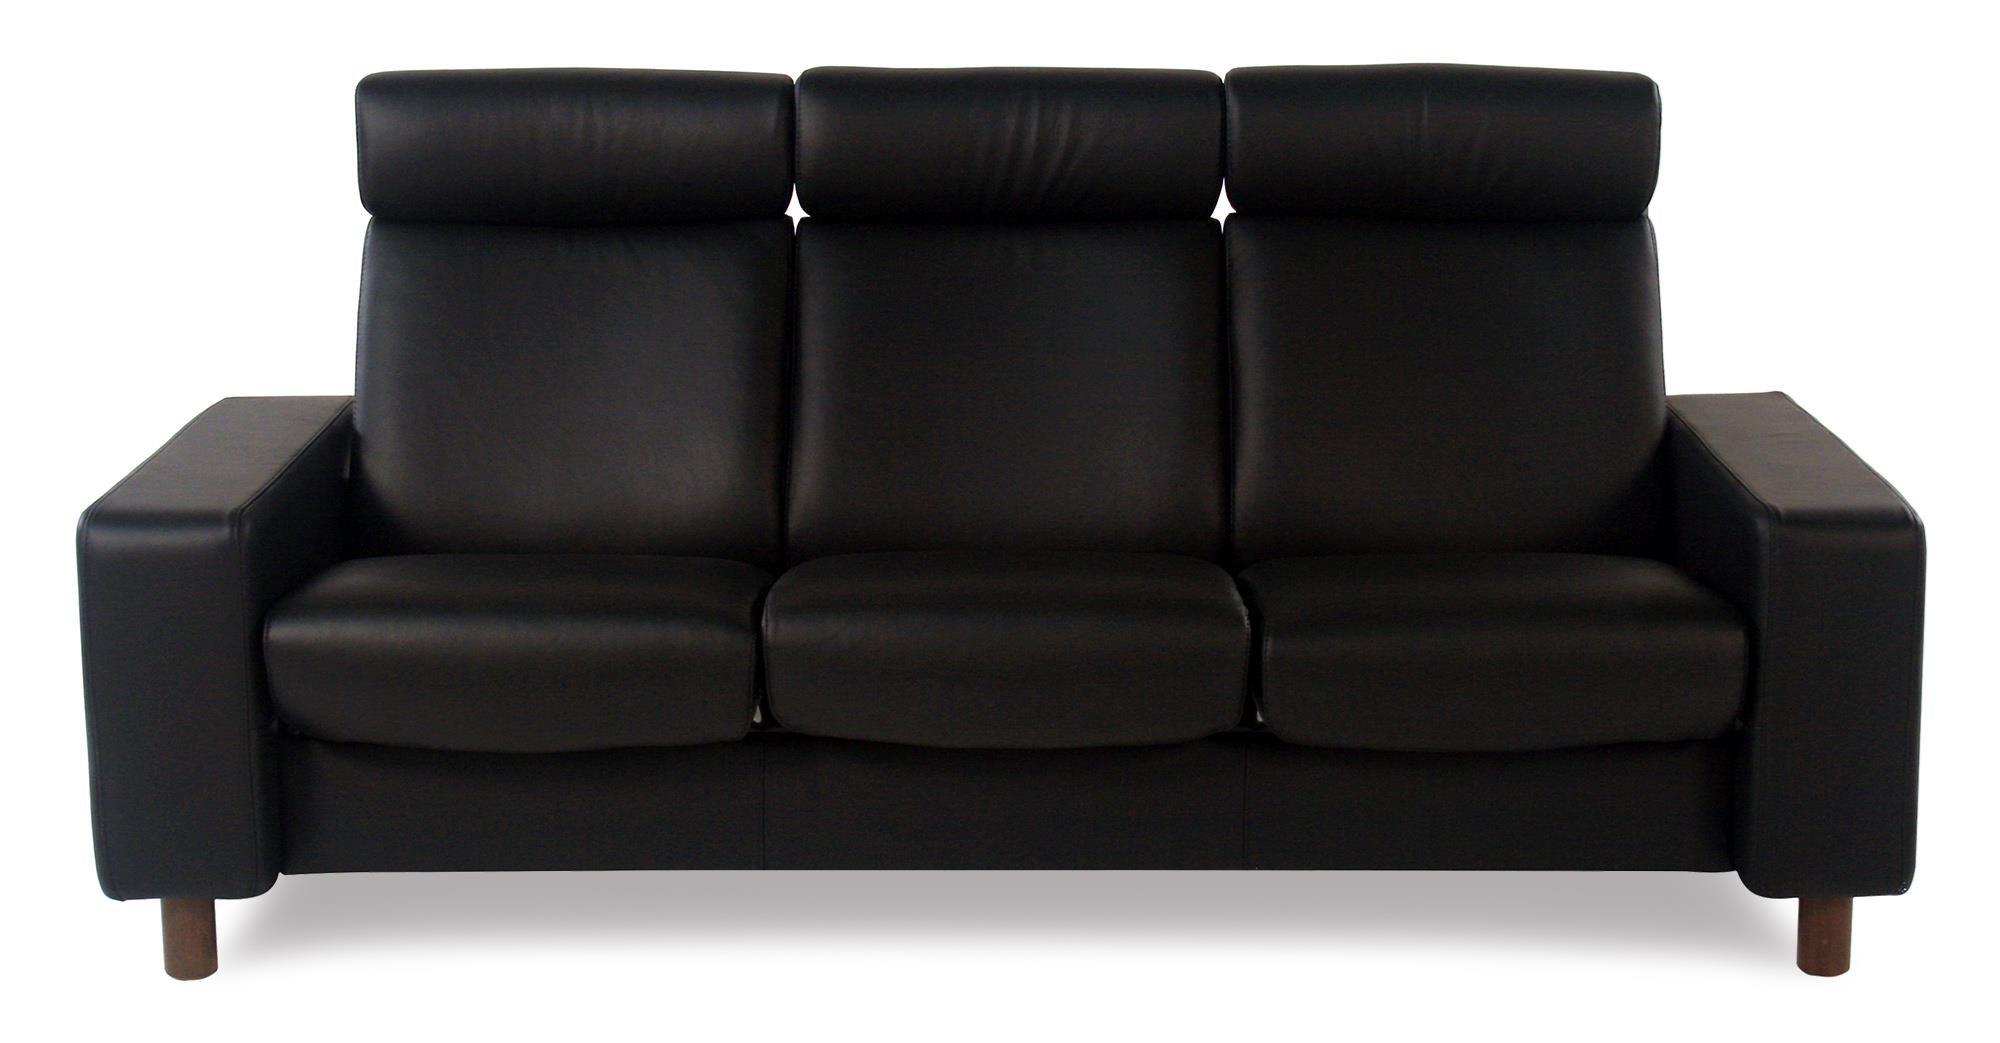 3-Seat High Back Sofa: Paloma Black w/ Walnut Finish